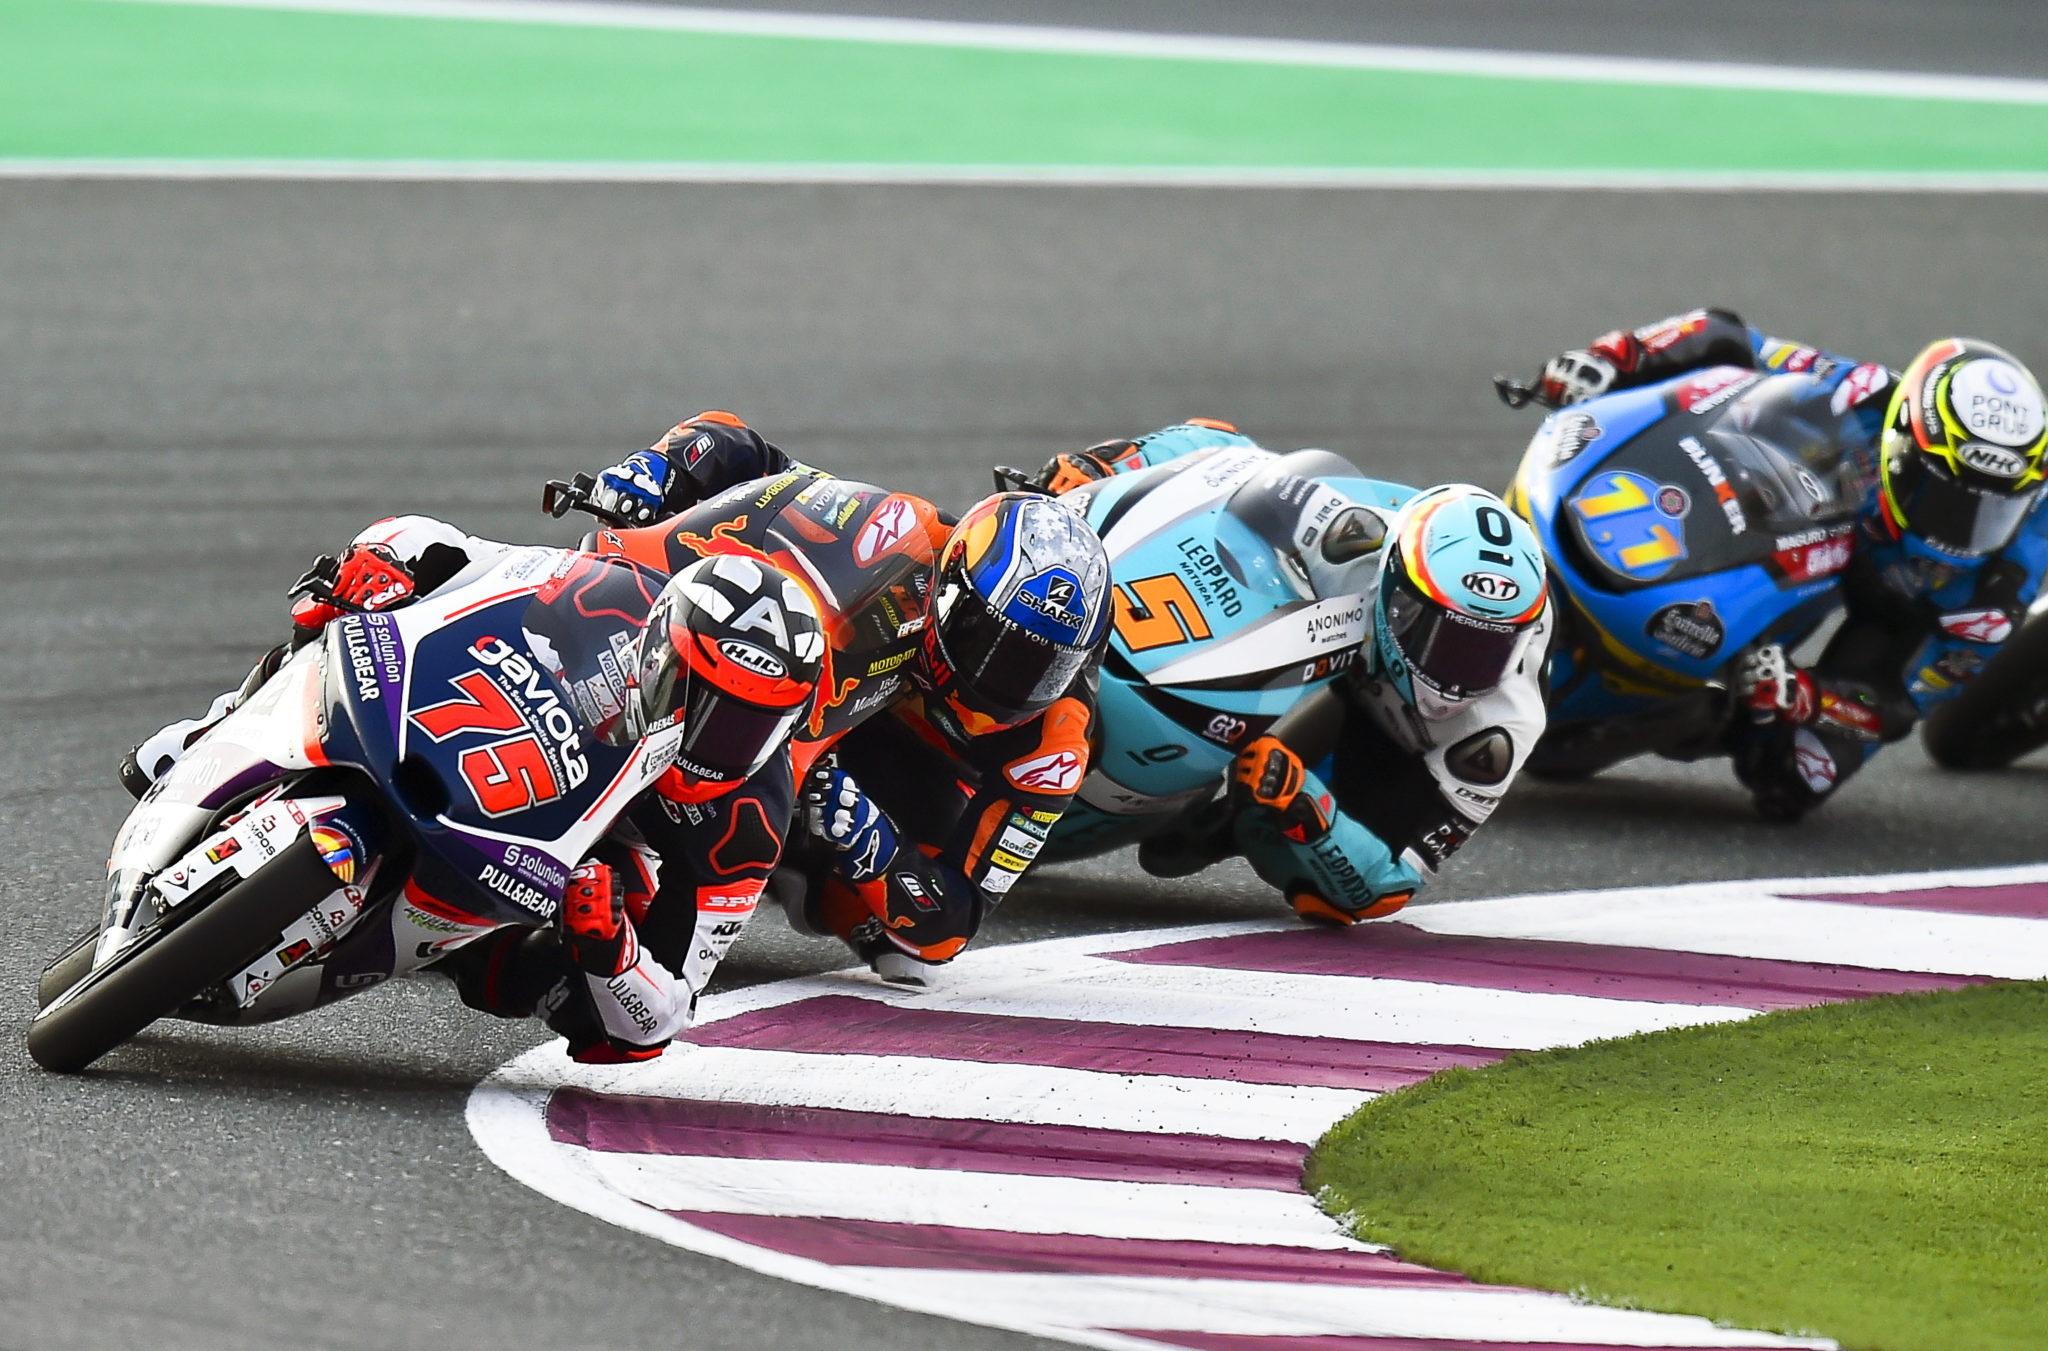 Katar: Motocyklowy Grand Prix w Doha, fot. EPA/NOUSHAD THEKKAYIL